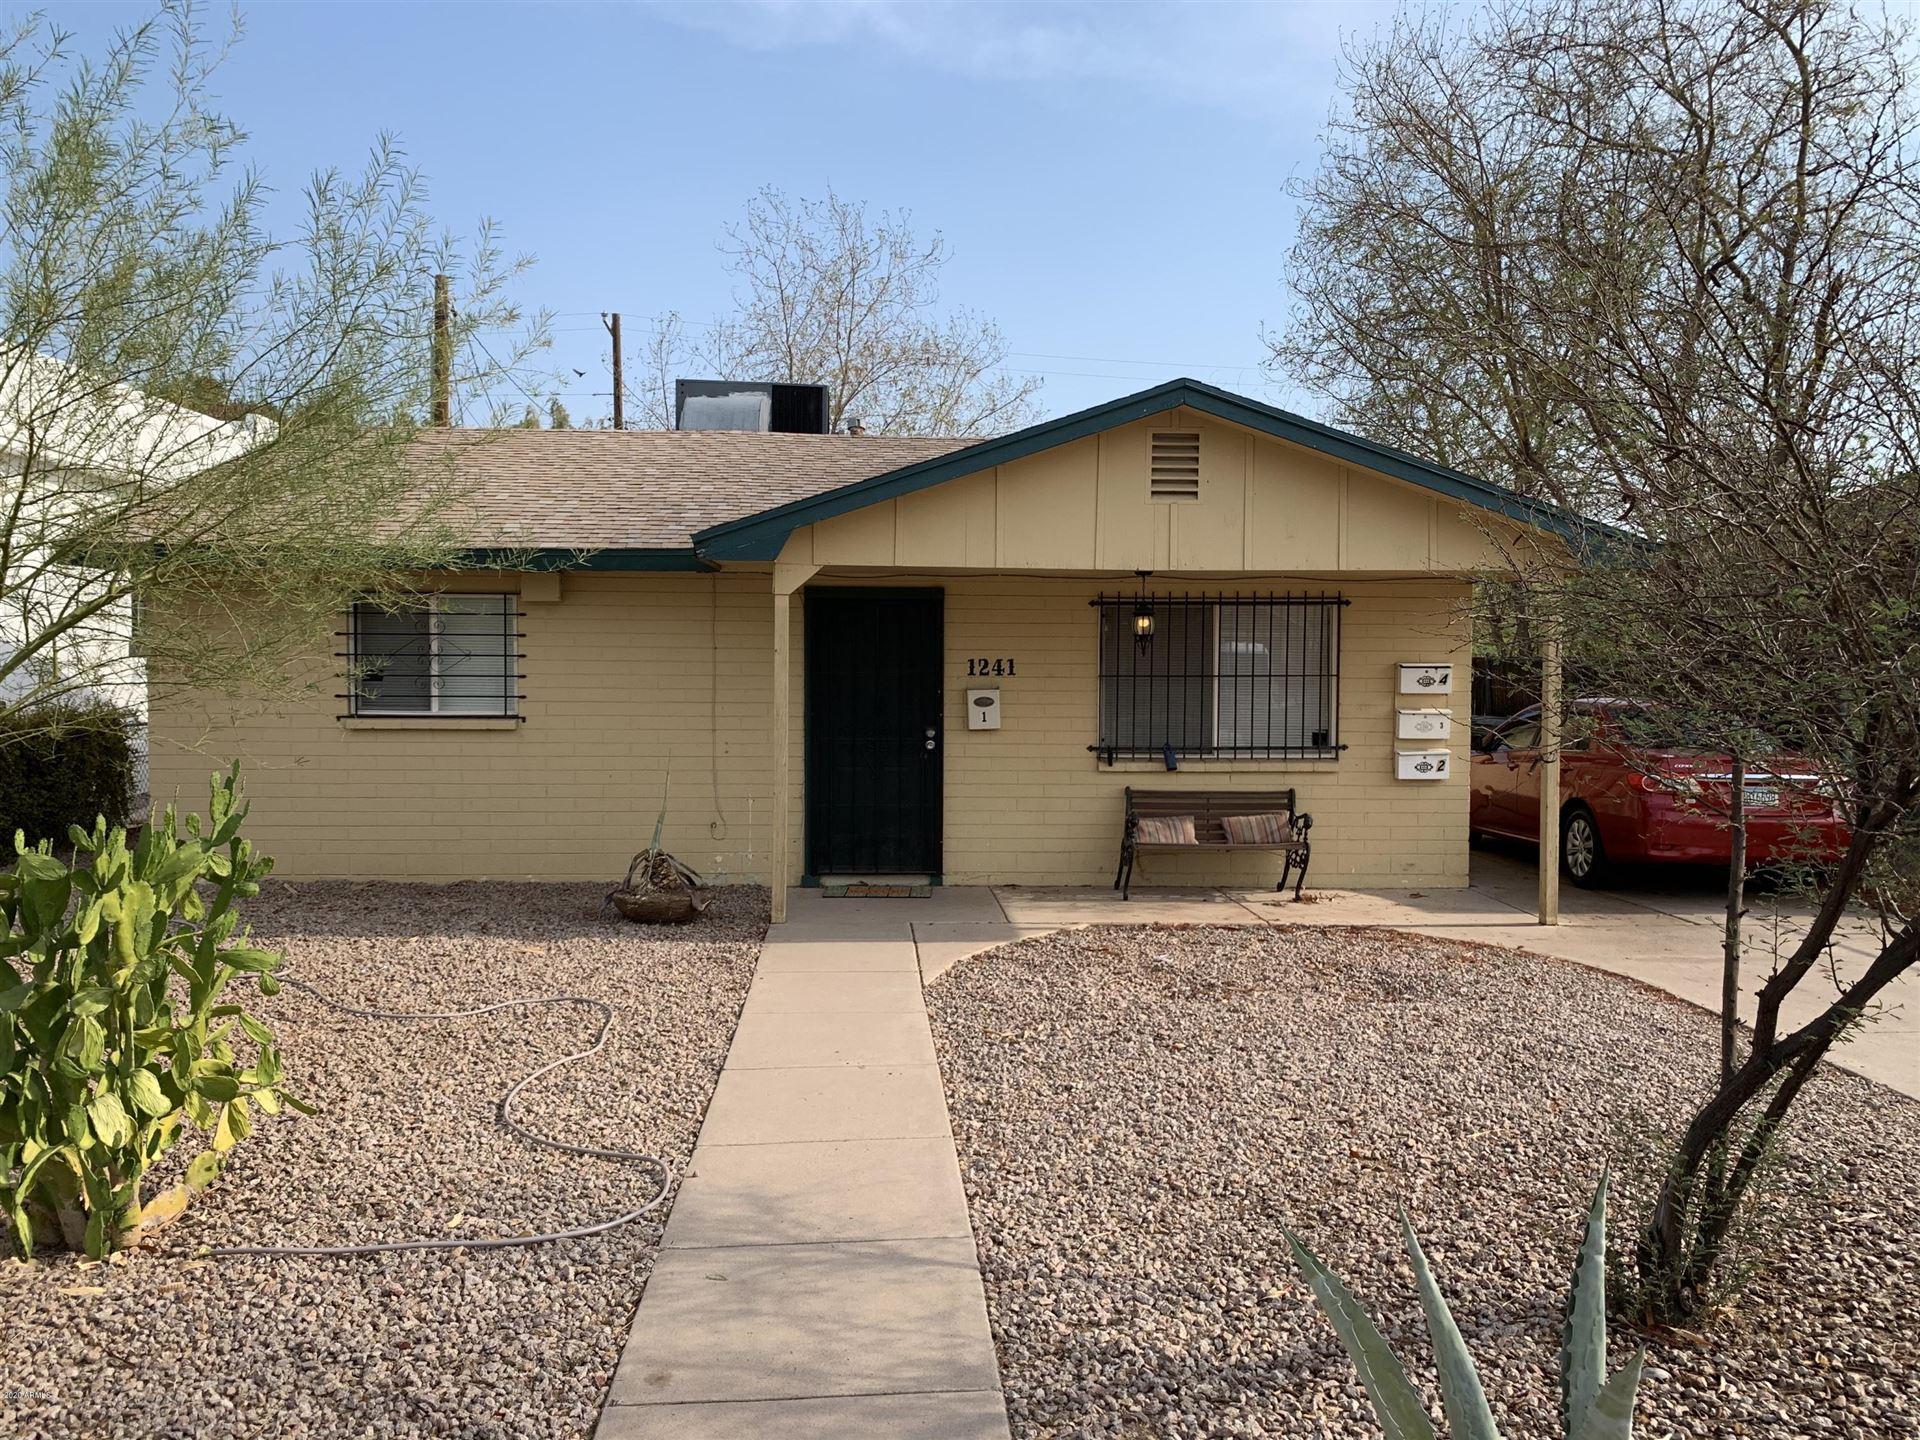 1241 E MCKINLEY Street, Phoenix, AZ 85006 - MLS#: 6119700